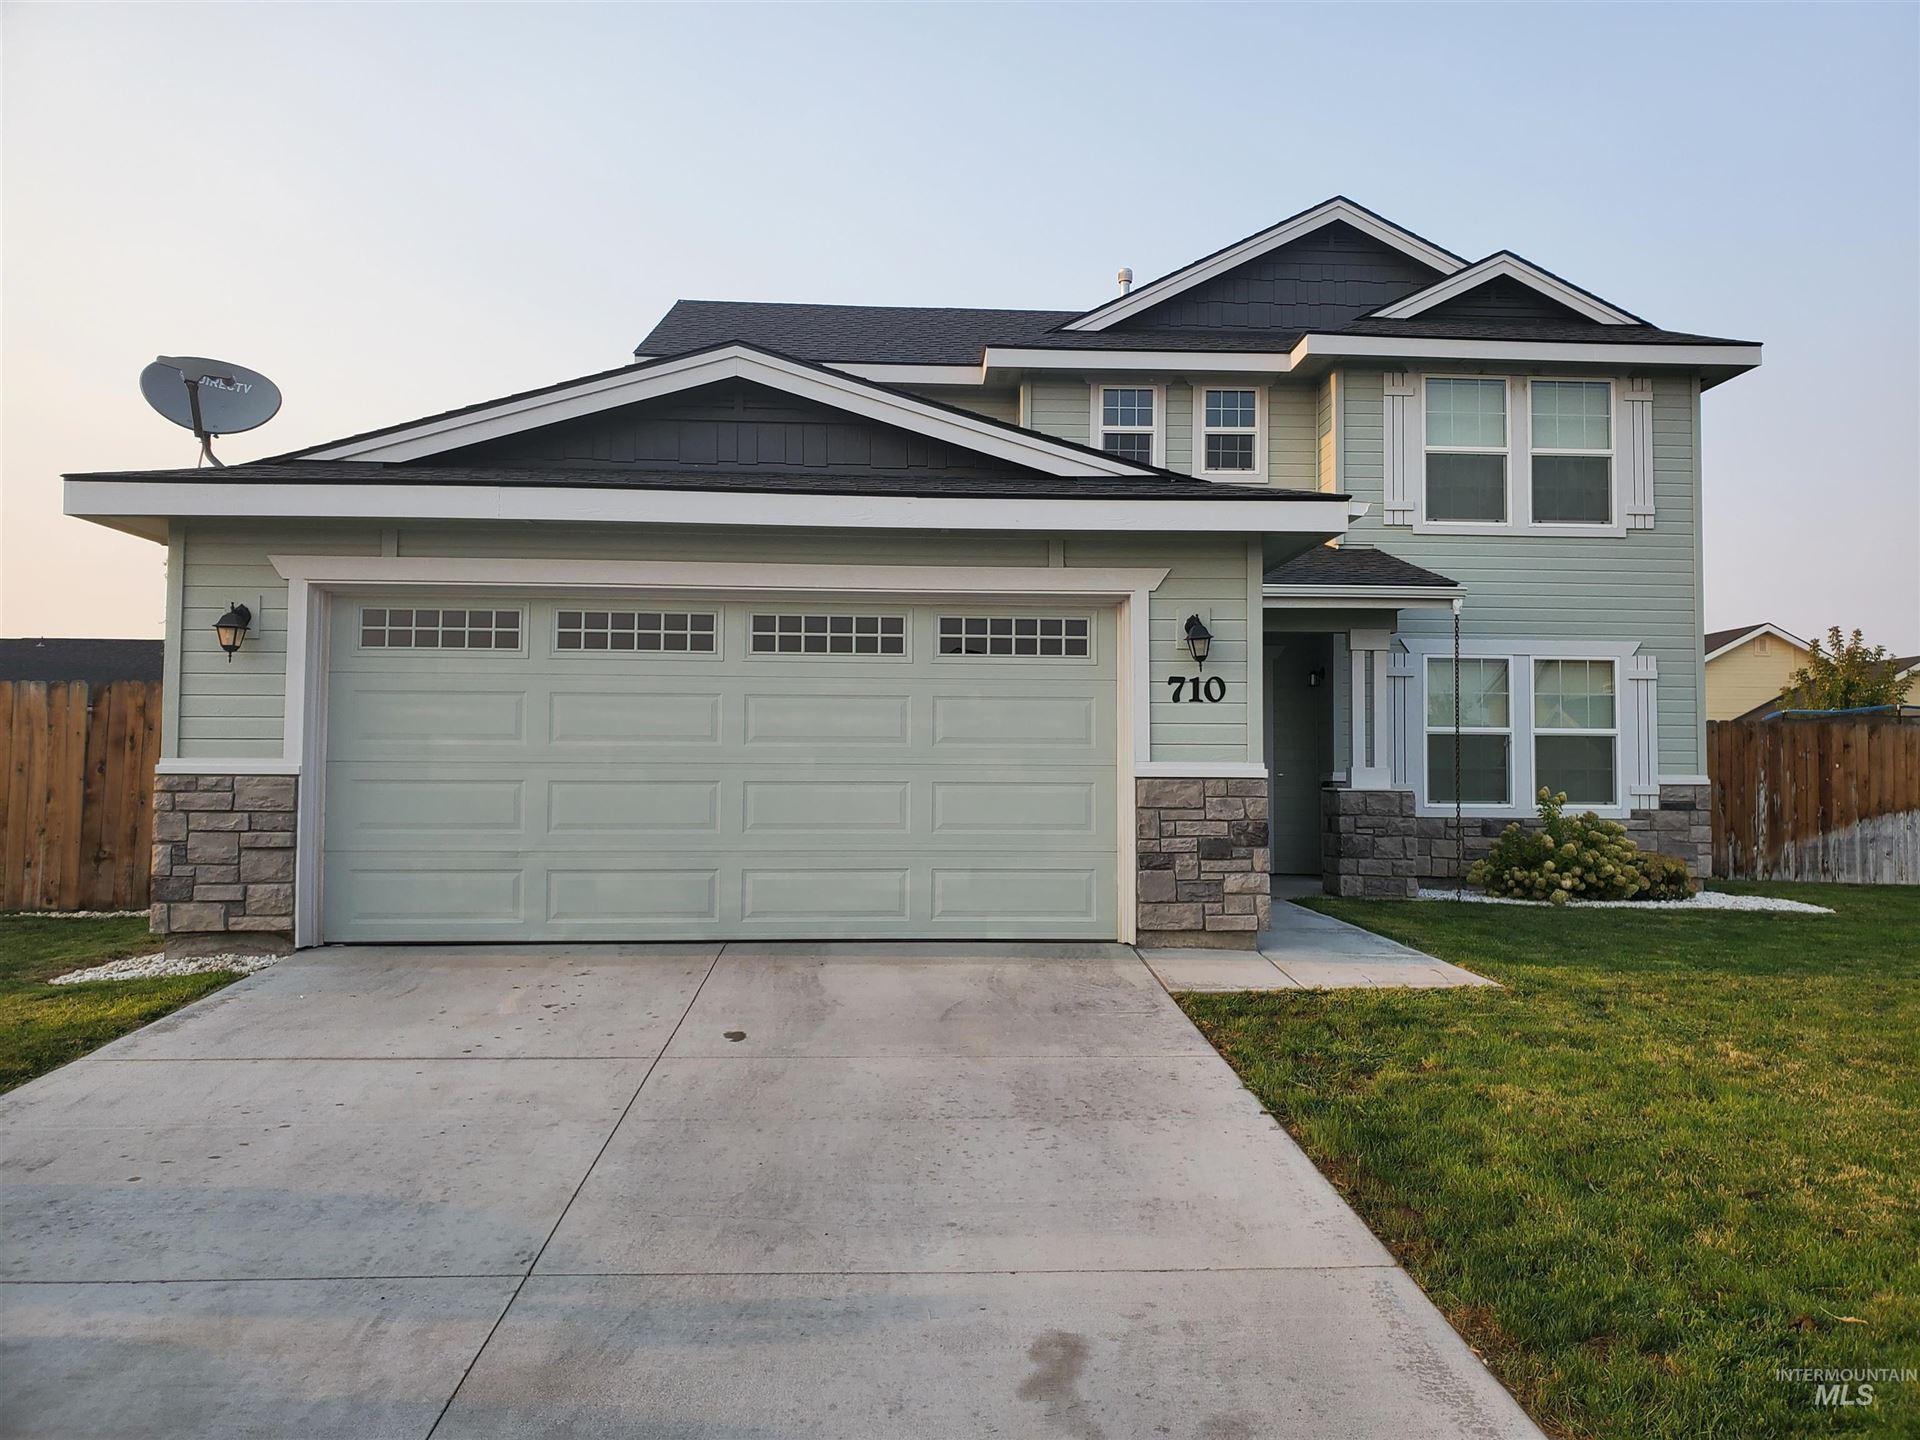 710 SW Huebert St, Mountain Home, ID 83647 - MLS#: 98817316